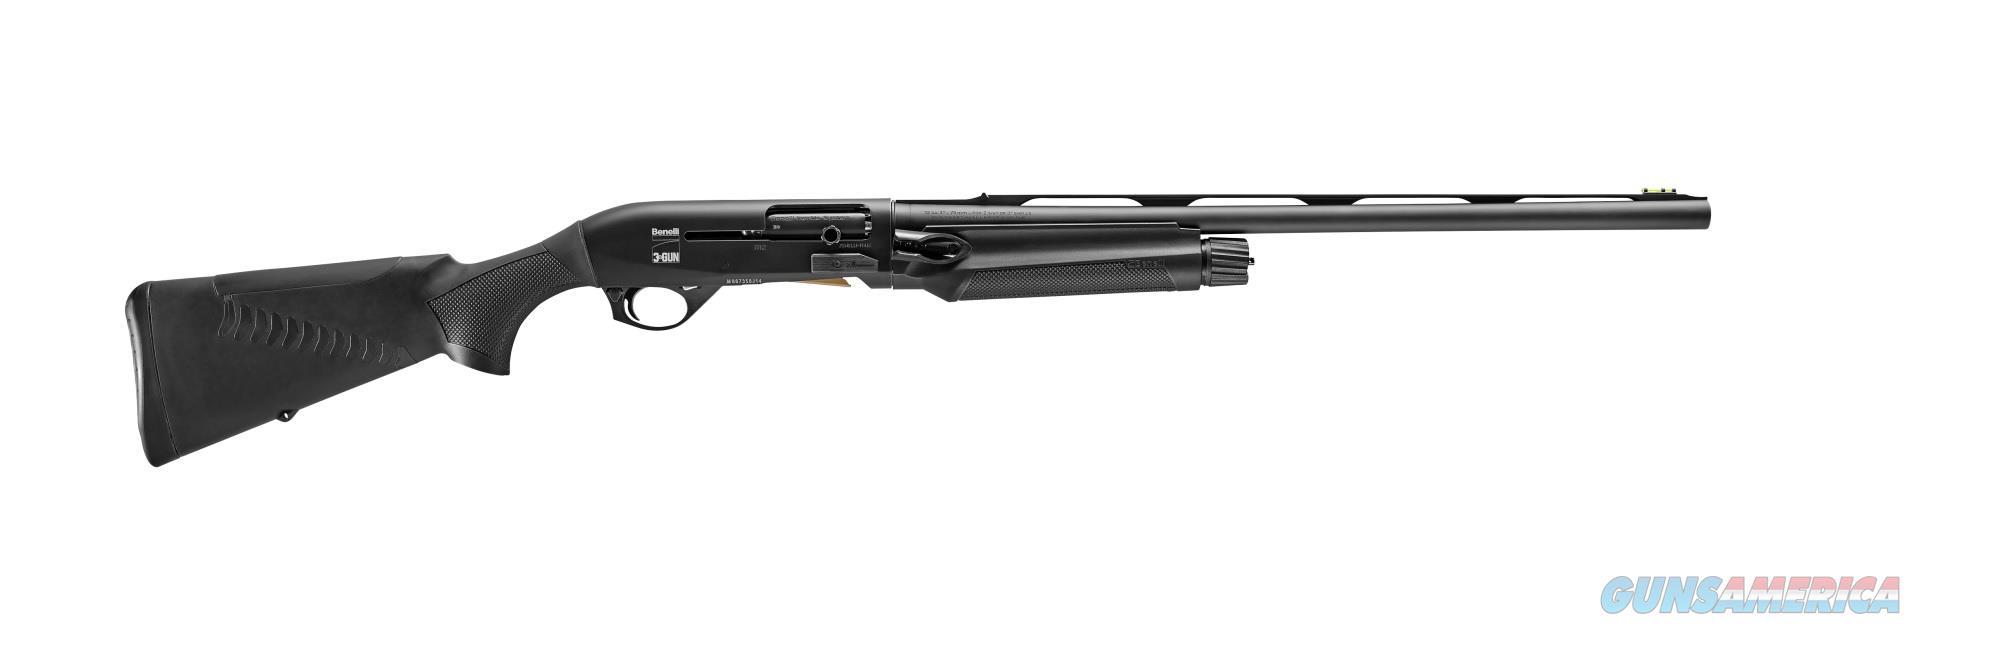 "Benelli Performance Shop M2 3-Gun Edition 12 GA 24"" 11022  Guns > Shotguns > Benelli Shotguns > Trap/Skeet"